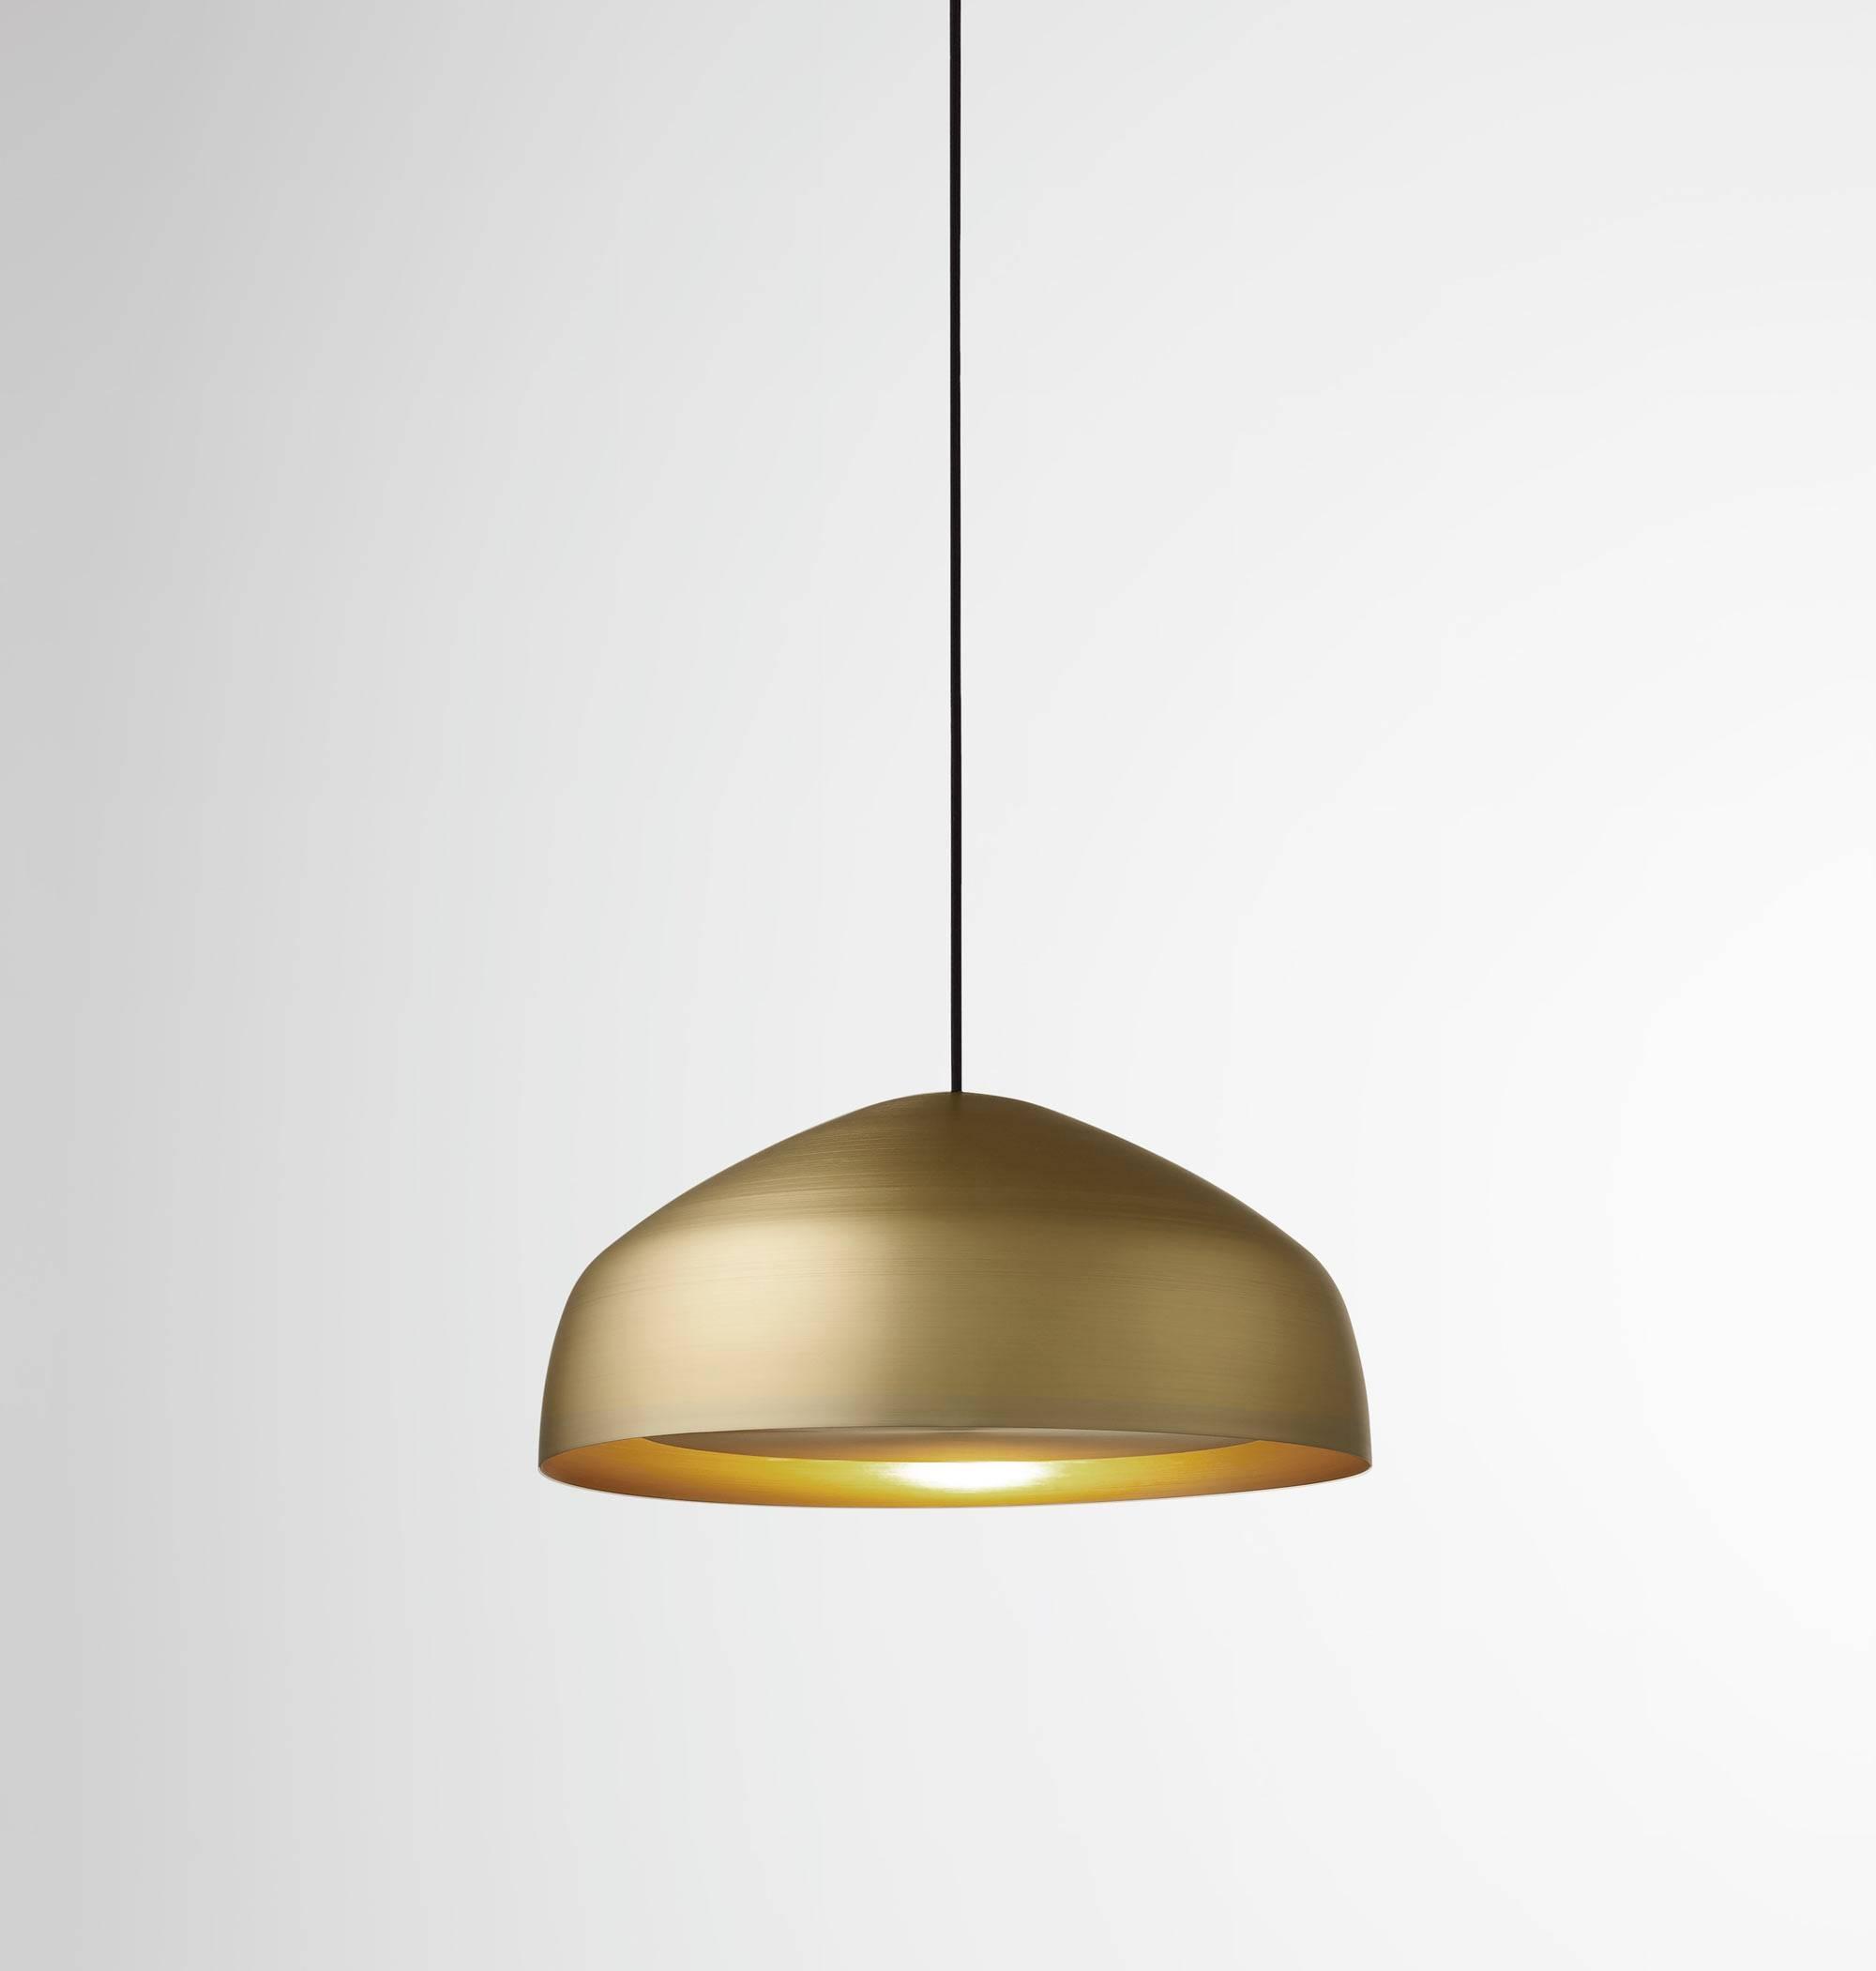 Kitchen Lighting Melbourne: 15 Ideas Of Pendant Lights Melbourne